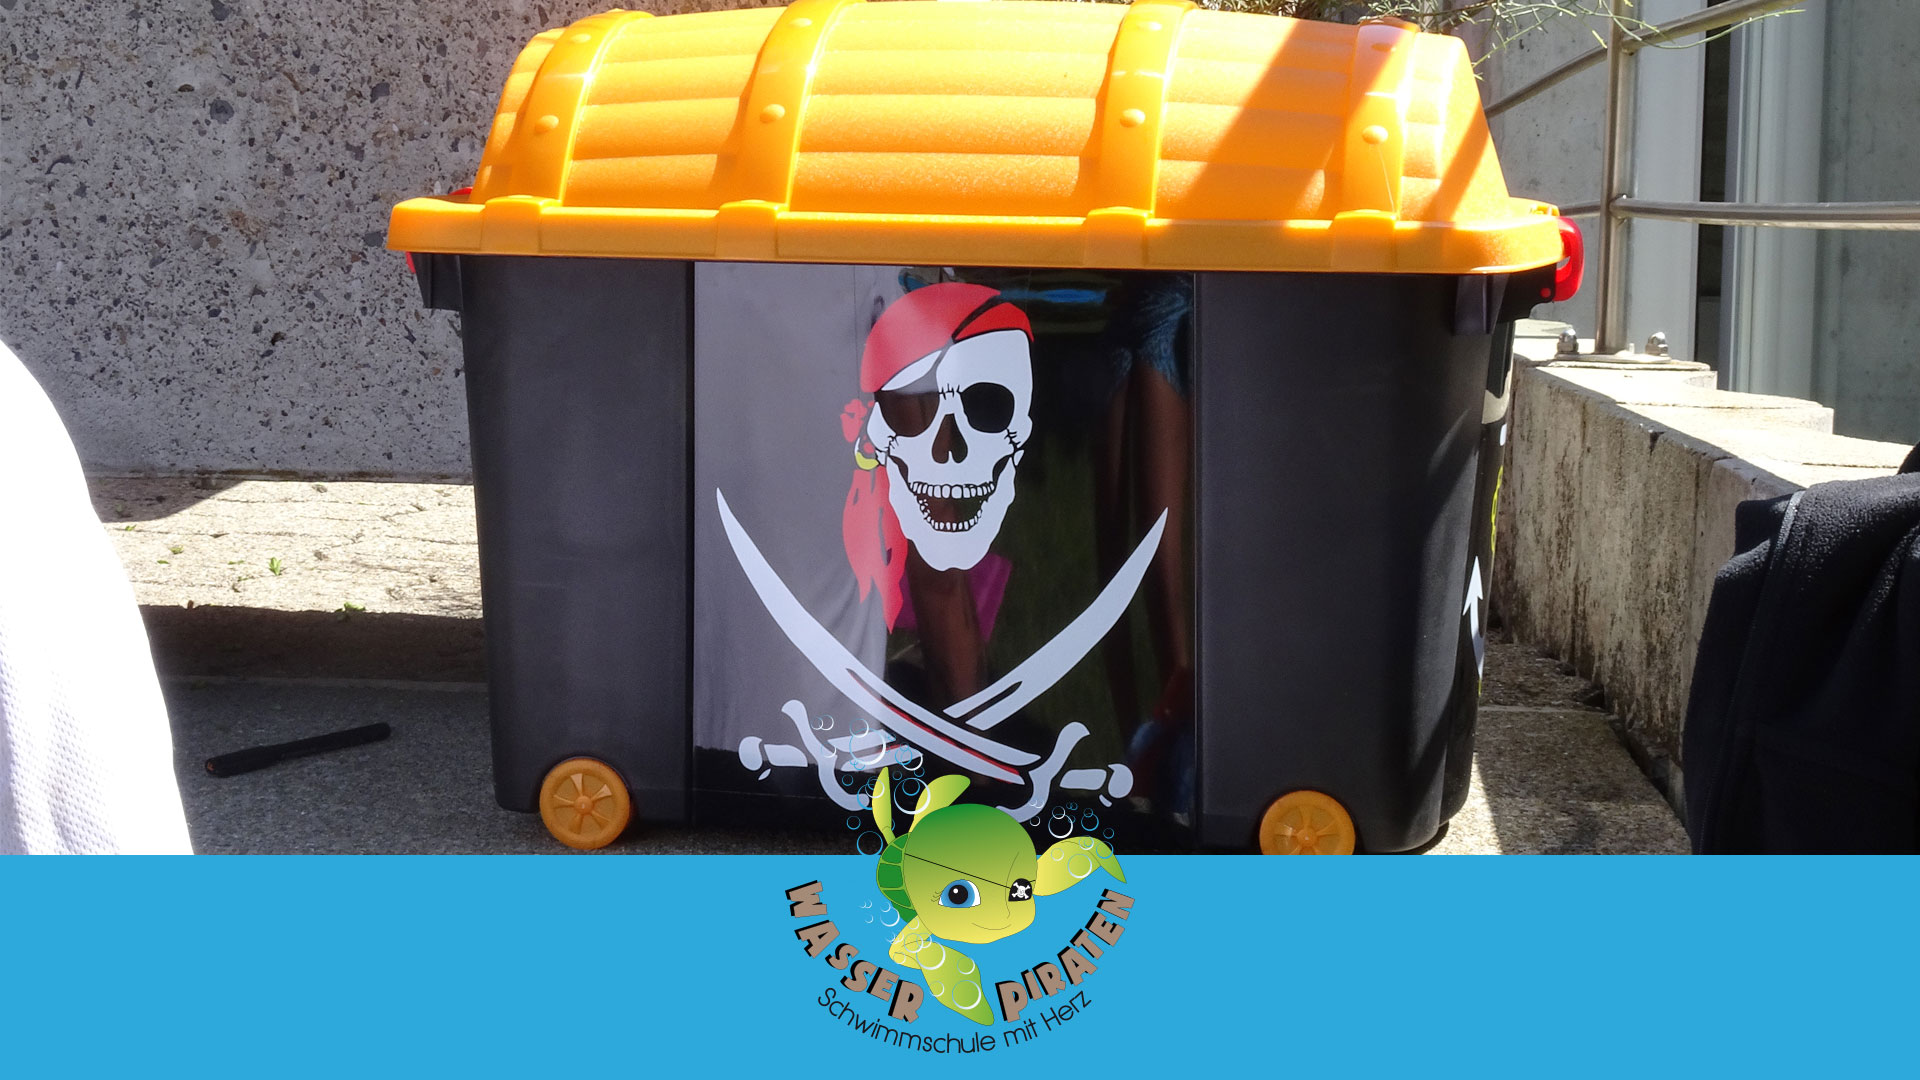 ser piraten img 2015 03 27T13 51 48Z s